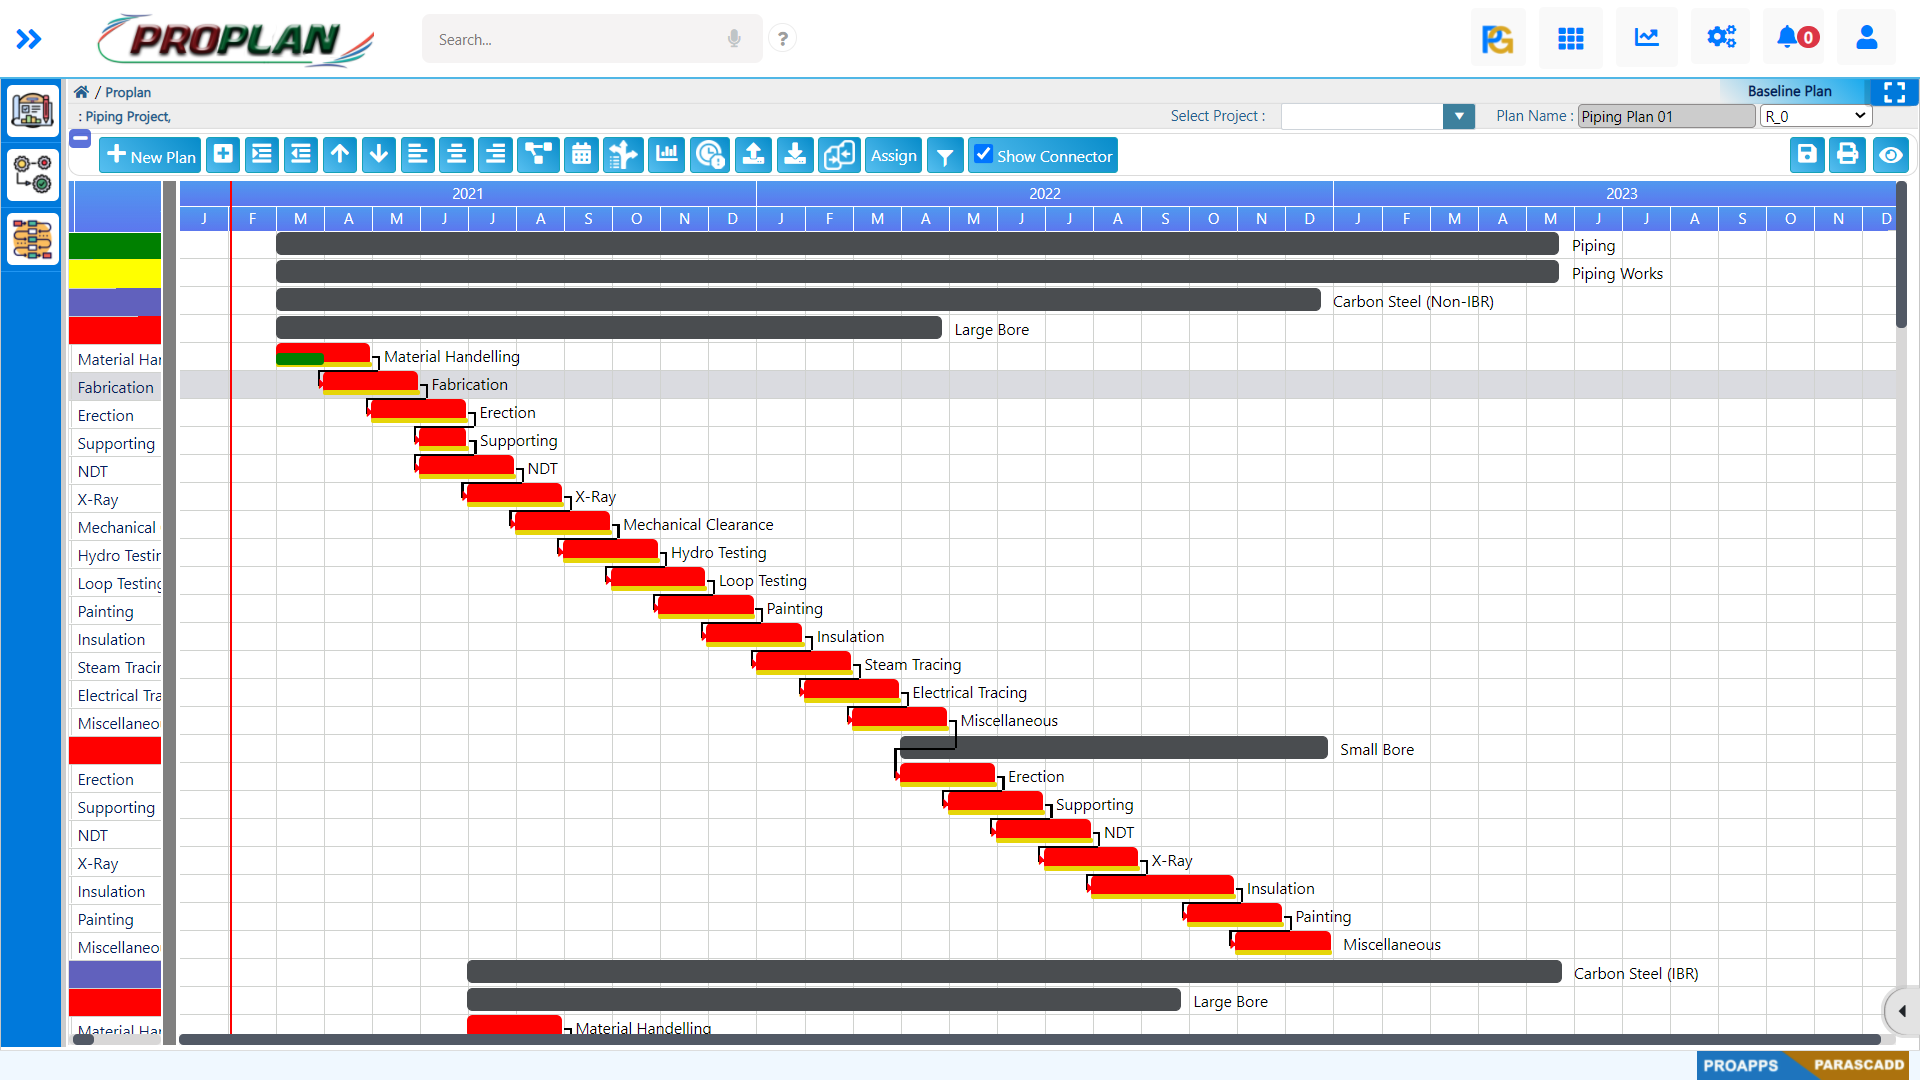 PROPLAN Gantt Chart